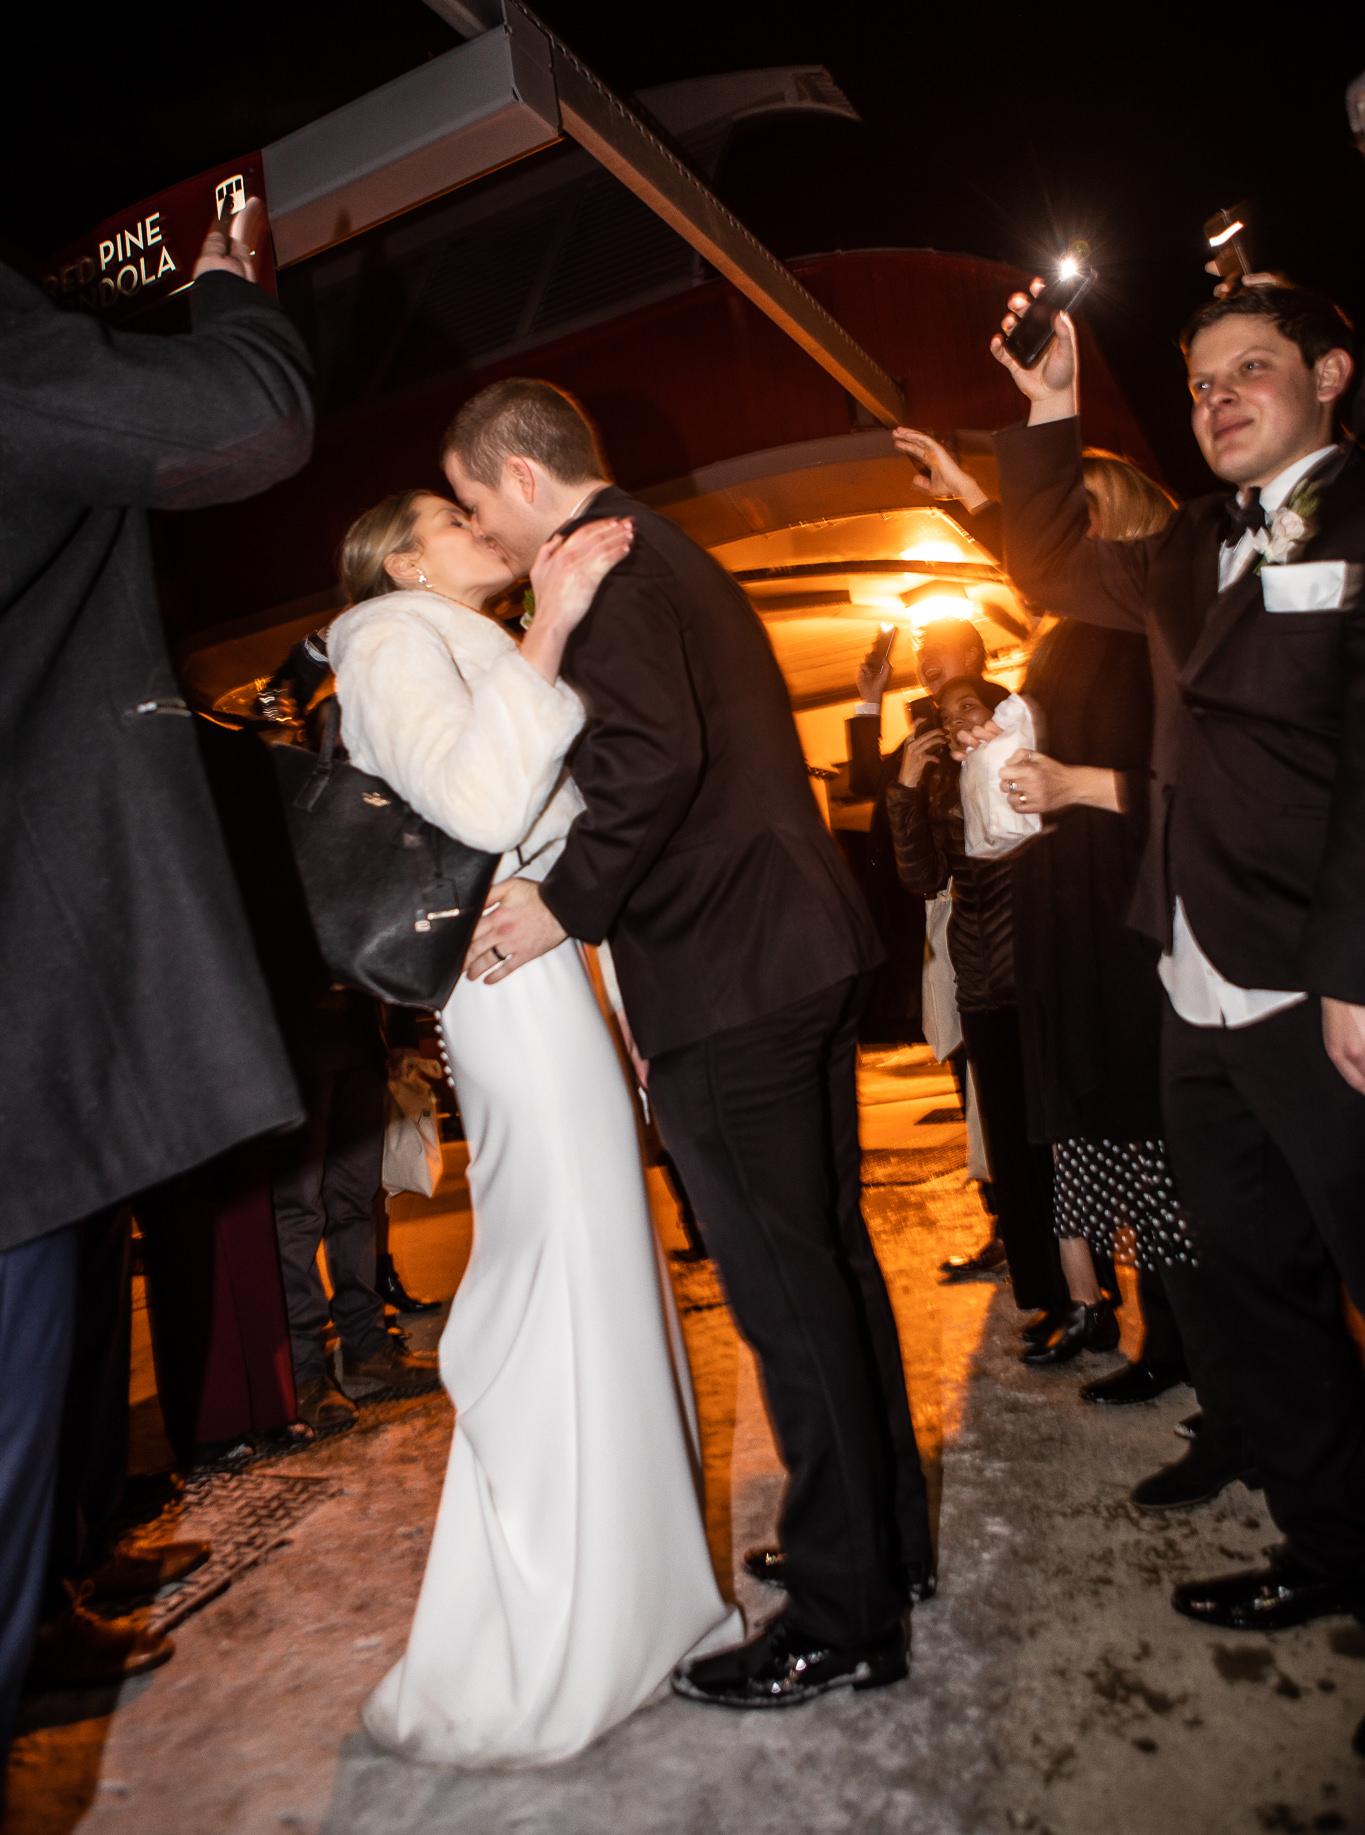 Winter Wedding Exit Photo